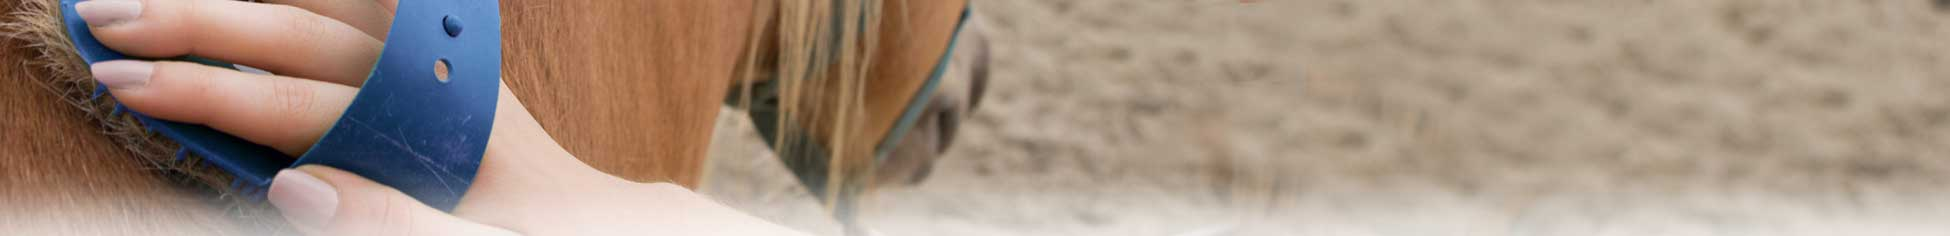 Horse Grooming Equipment